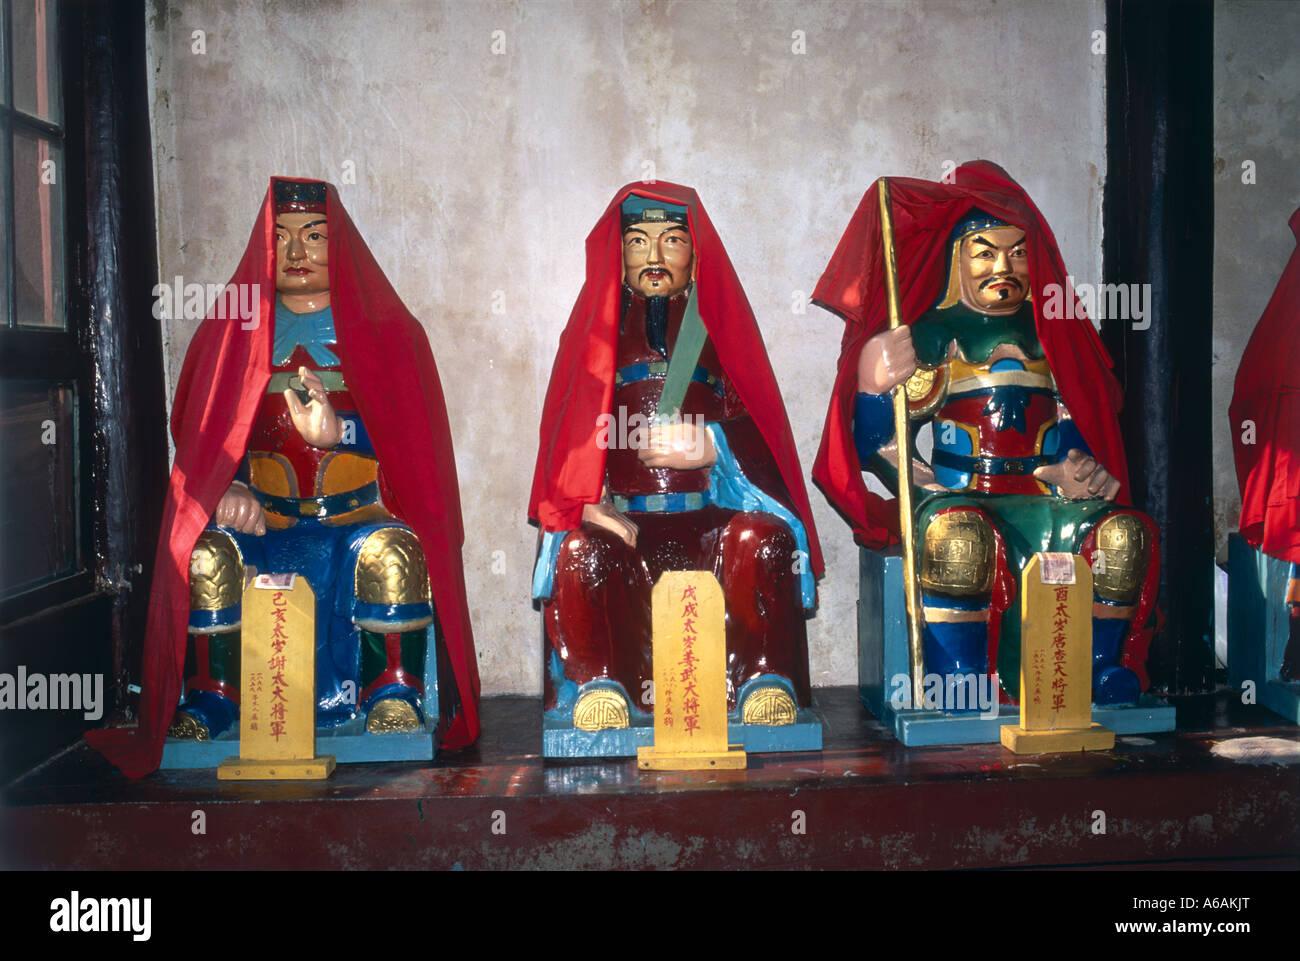 China, Hubei, Wuhan, Changchun Guan, colorful Daoist figurines in temple - Stock Image